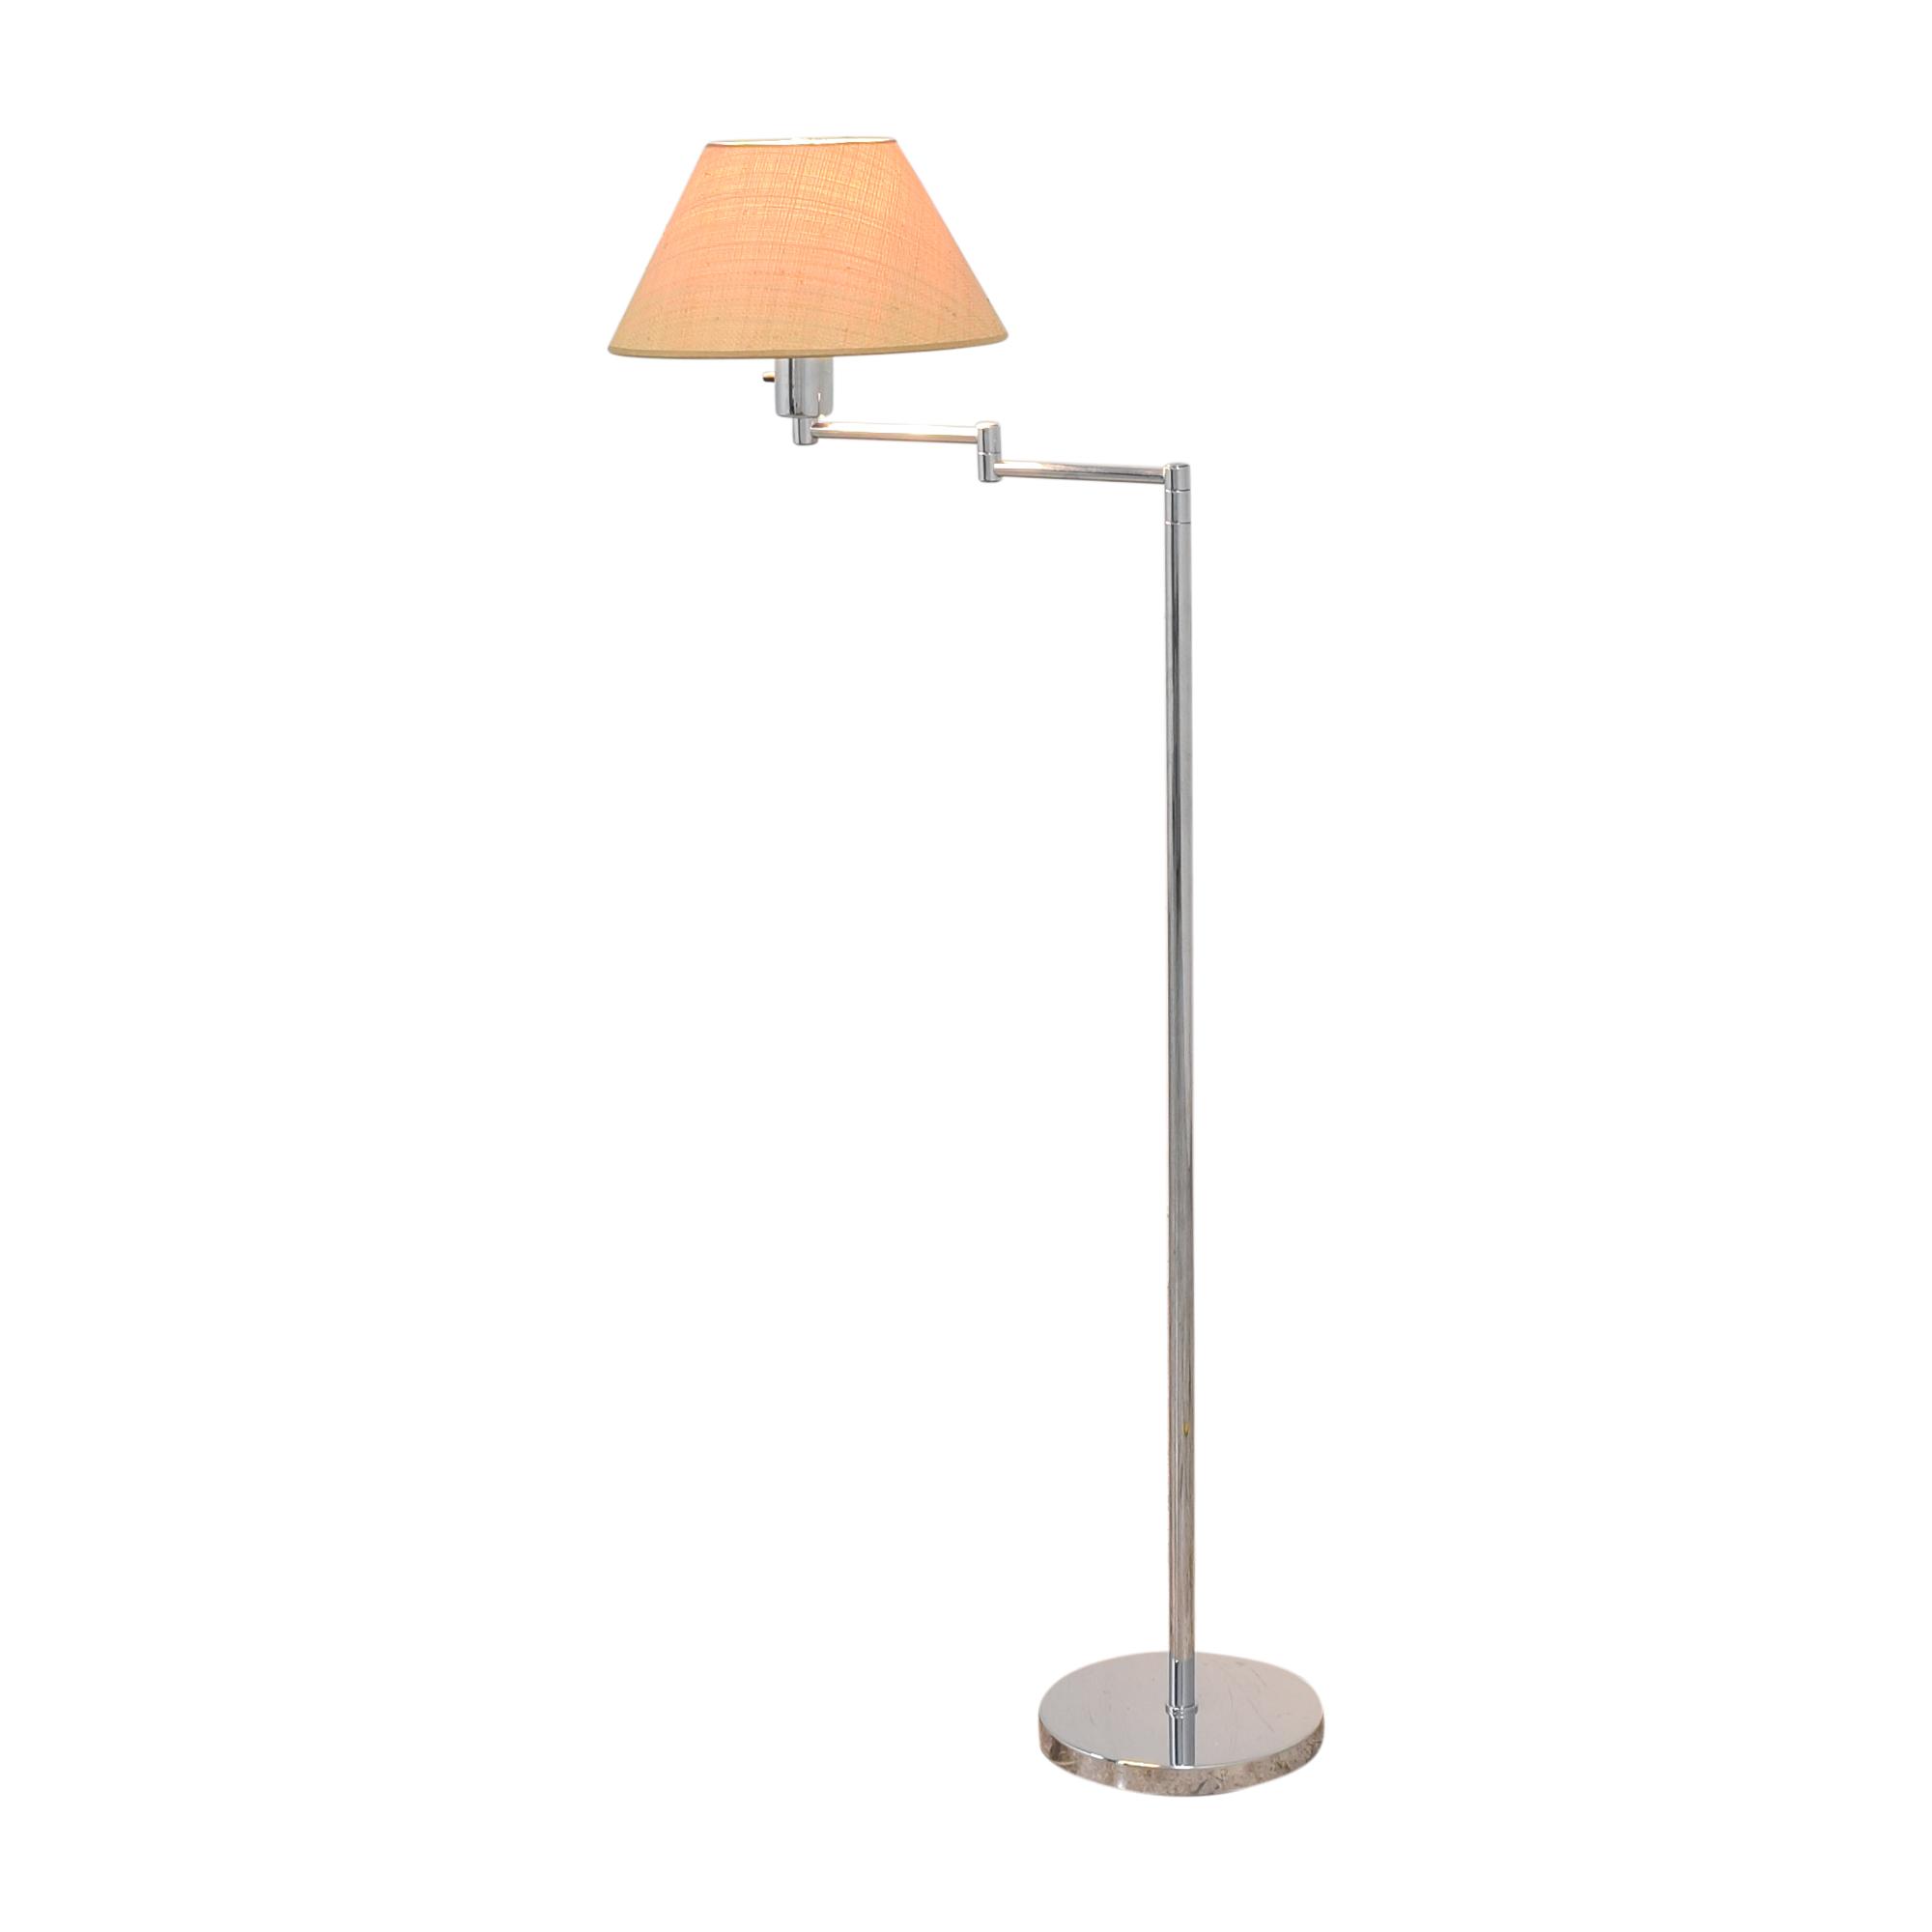 Scalamandre Scalamandre Hansen Double Swing Arm Floor Lamp silver and tan